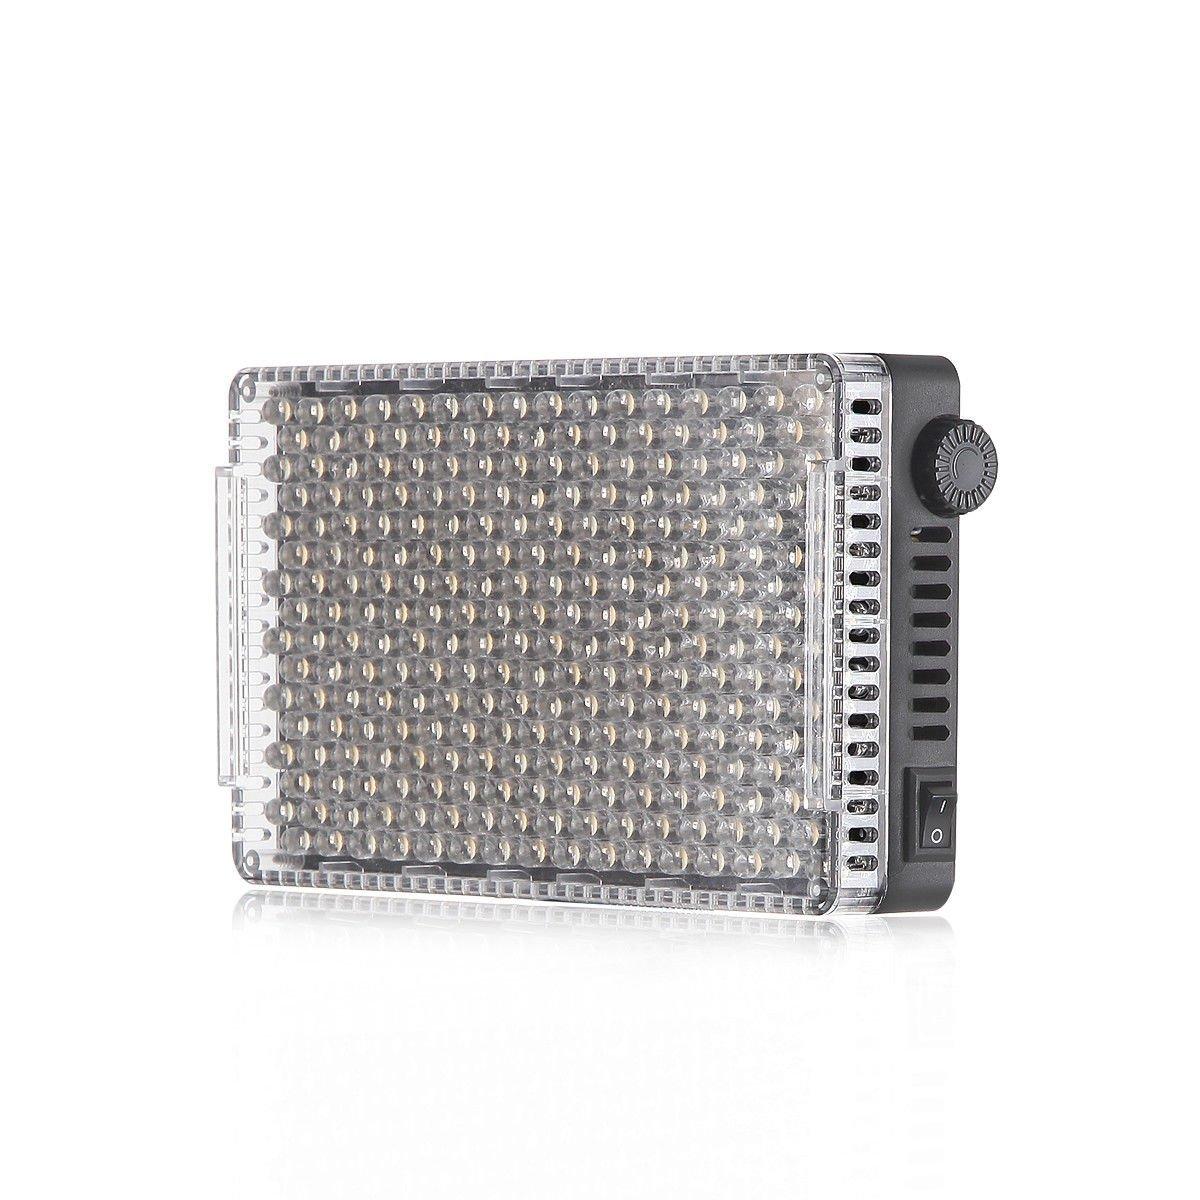 Aputure Amaran AL-F7 3200-9500K CRI/TLCI 95 LED panel LED video camera light (Aputure H198 Upgrade Version) with DigiKit cleaning cloth by Aputure (Image #3)